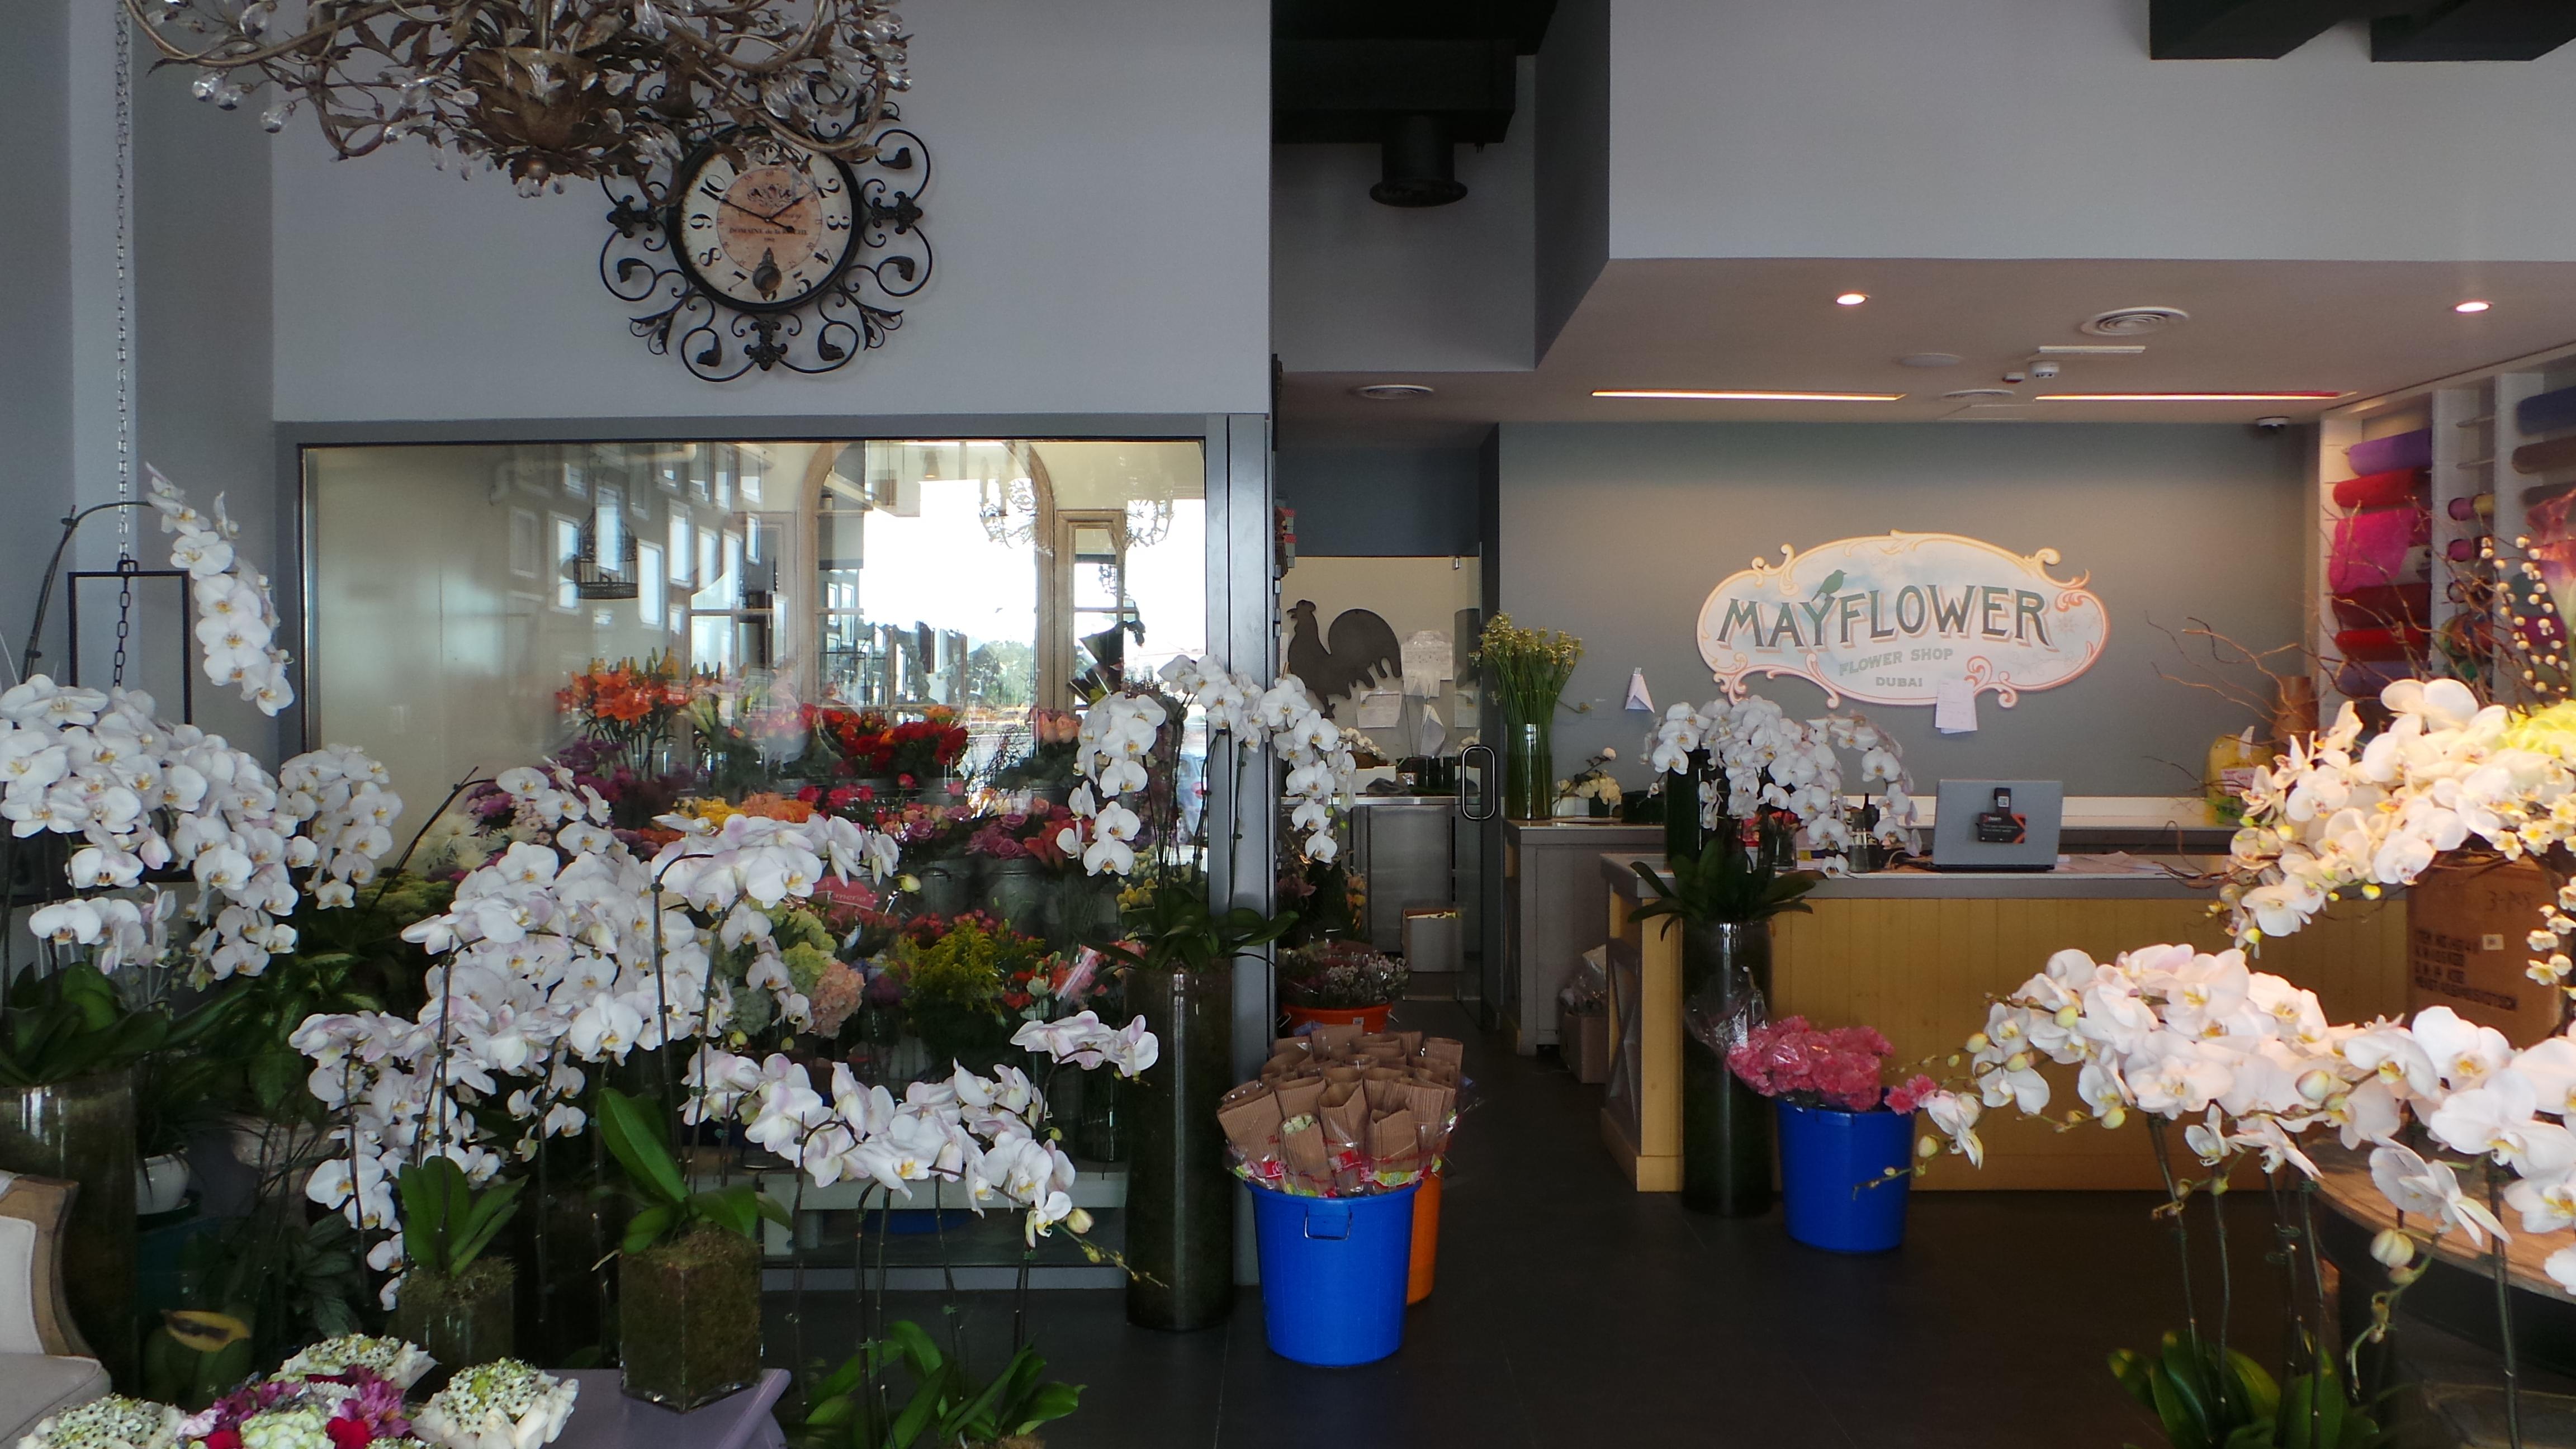 Mayflower flower shop the scoop dxb mayflower flower shop izmirmasajfo